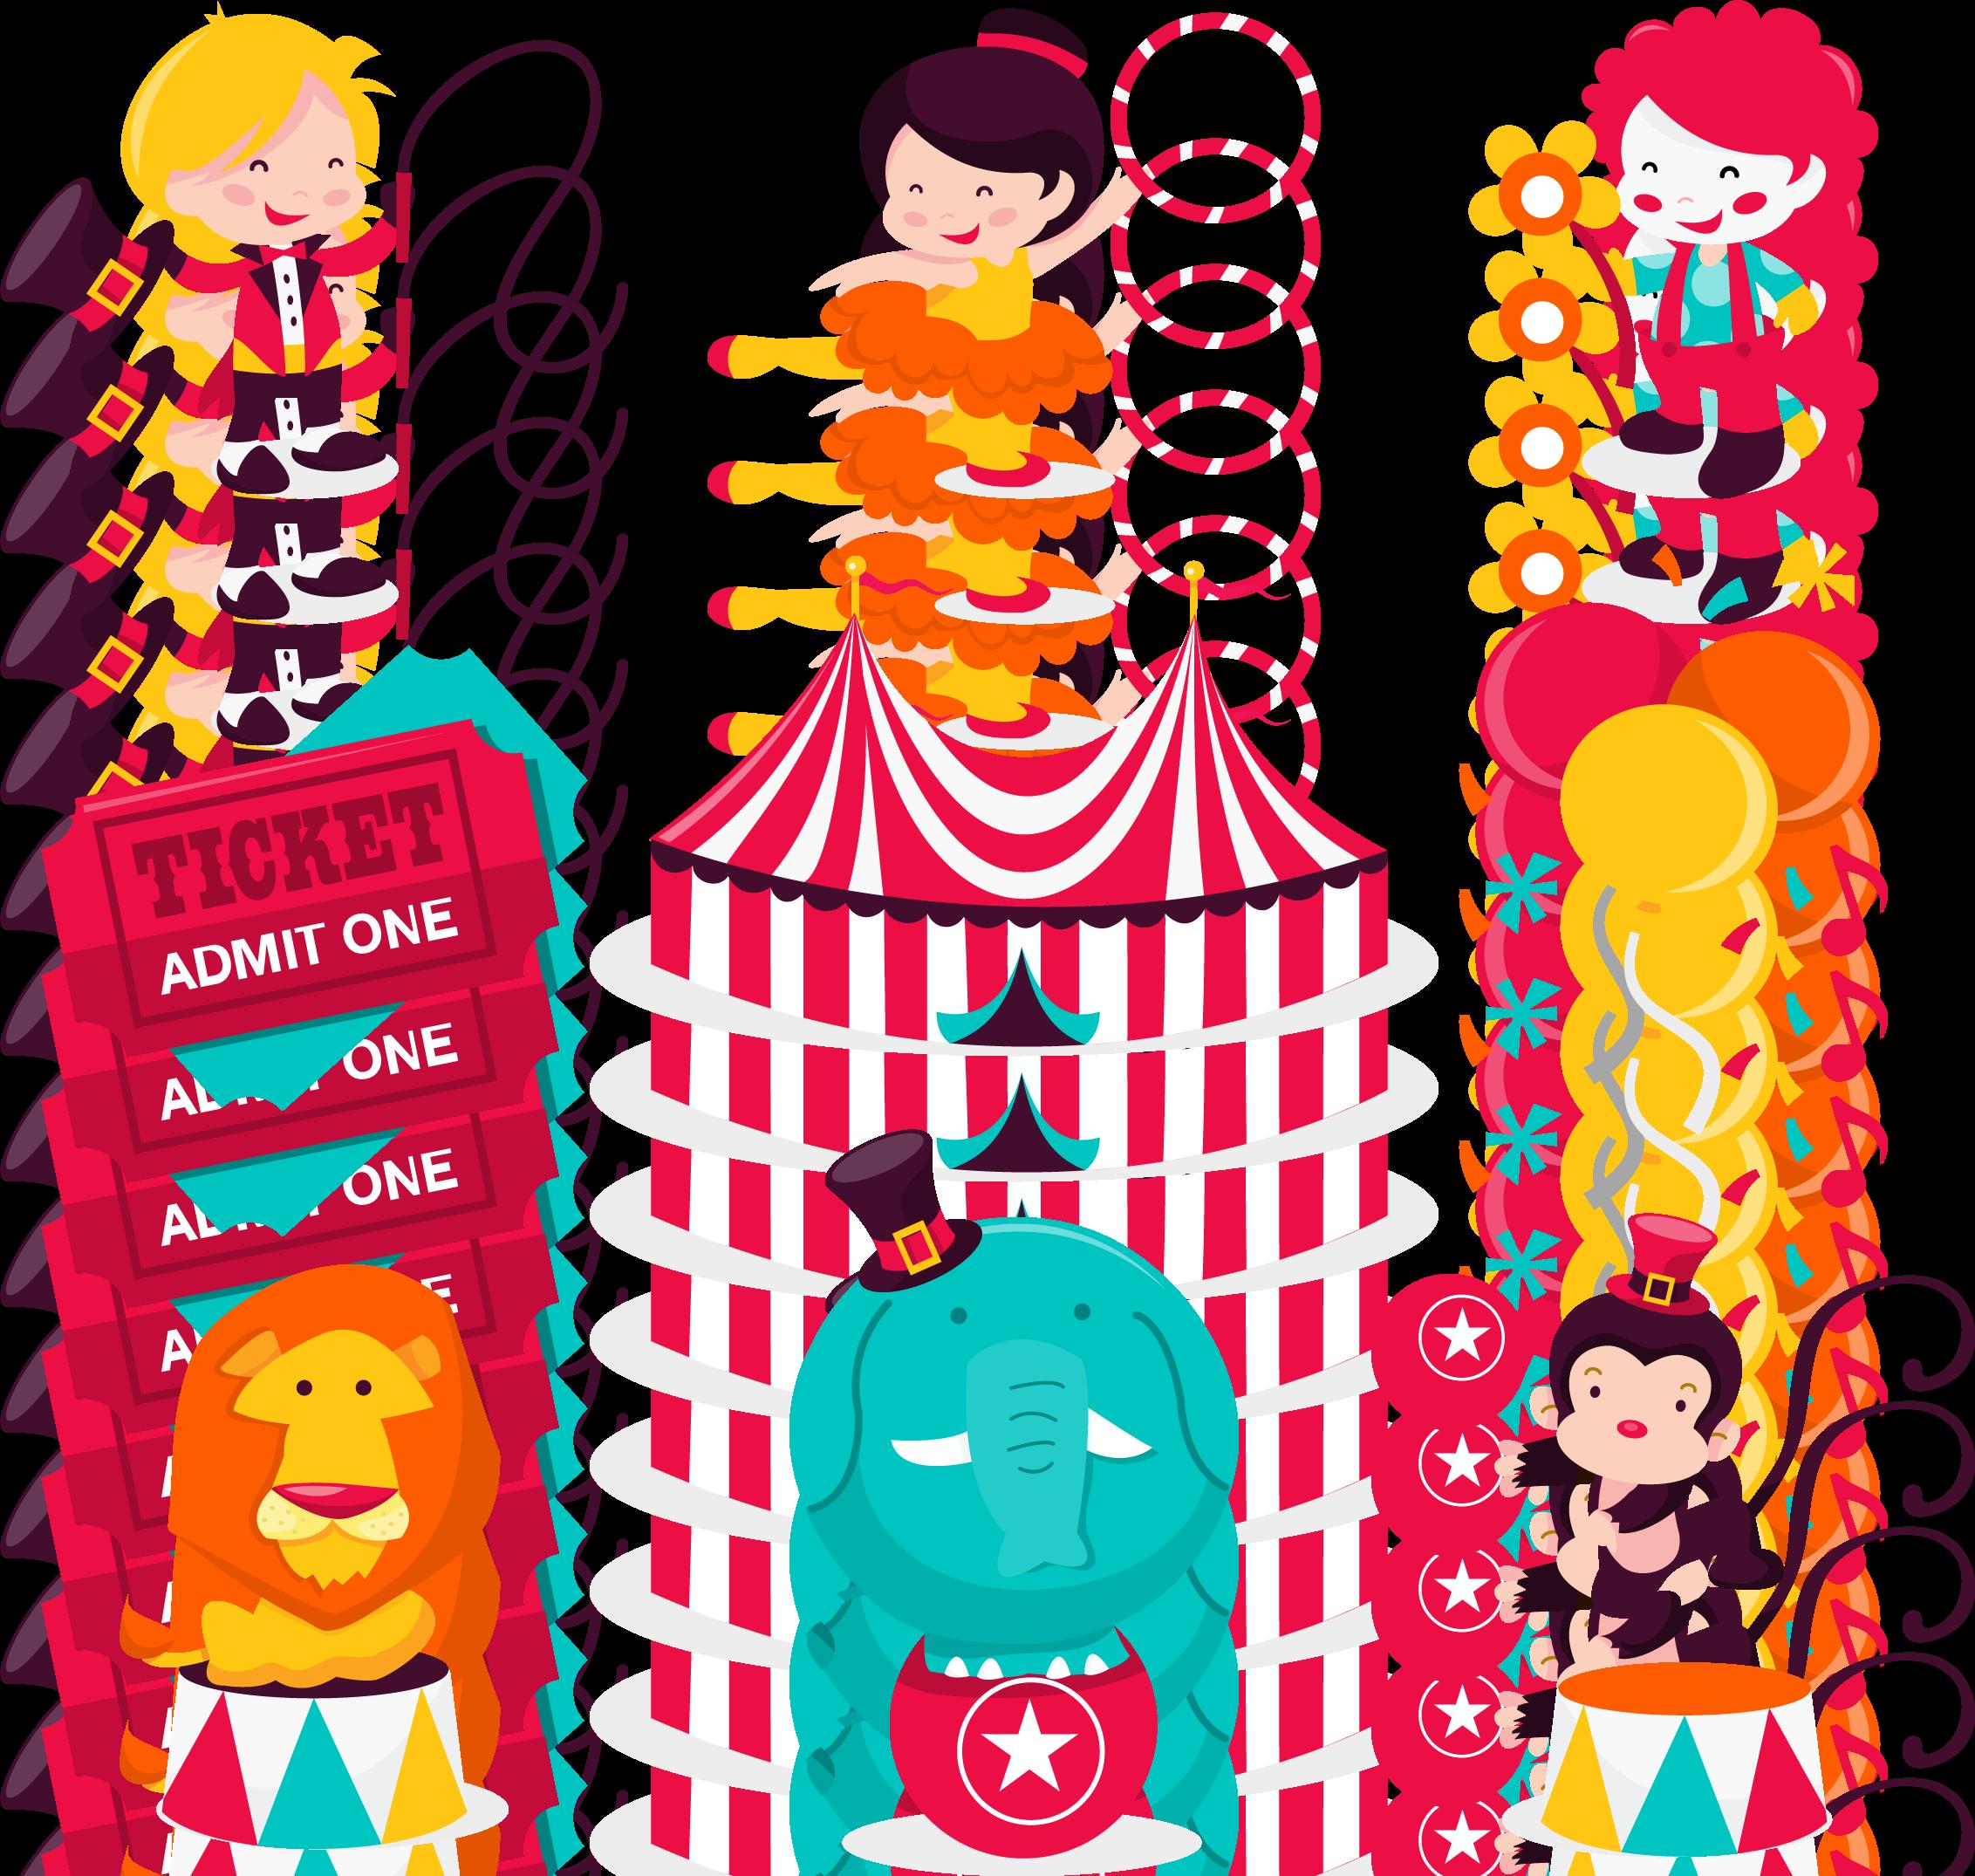 Light clipart circus, Light circus Transparent FREE for ...